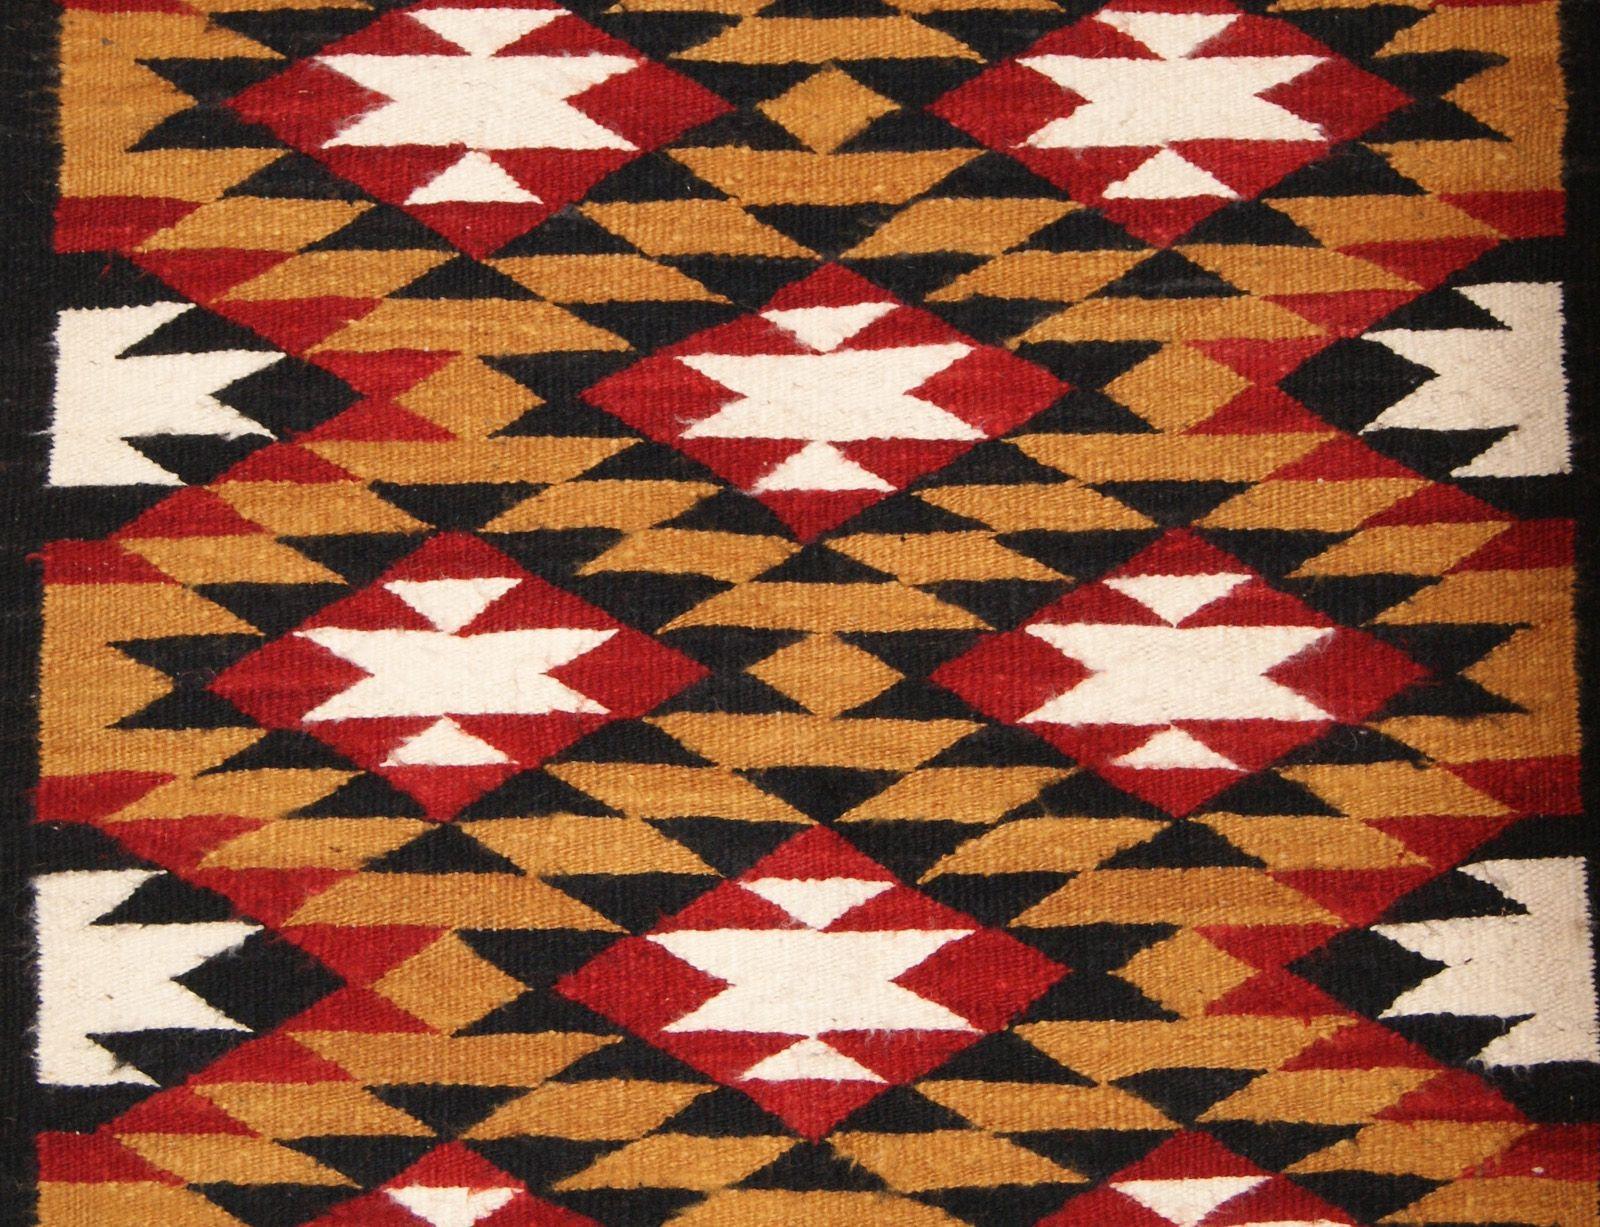 Navajo Double Saddle Blanket Navajo Weaving For Sale, Buy Yours Now! Great  Selection At Charleyu0027s Navajo Rugs, Satisfaction Guaranteed.